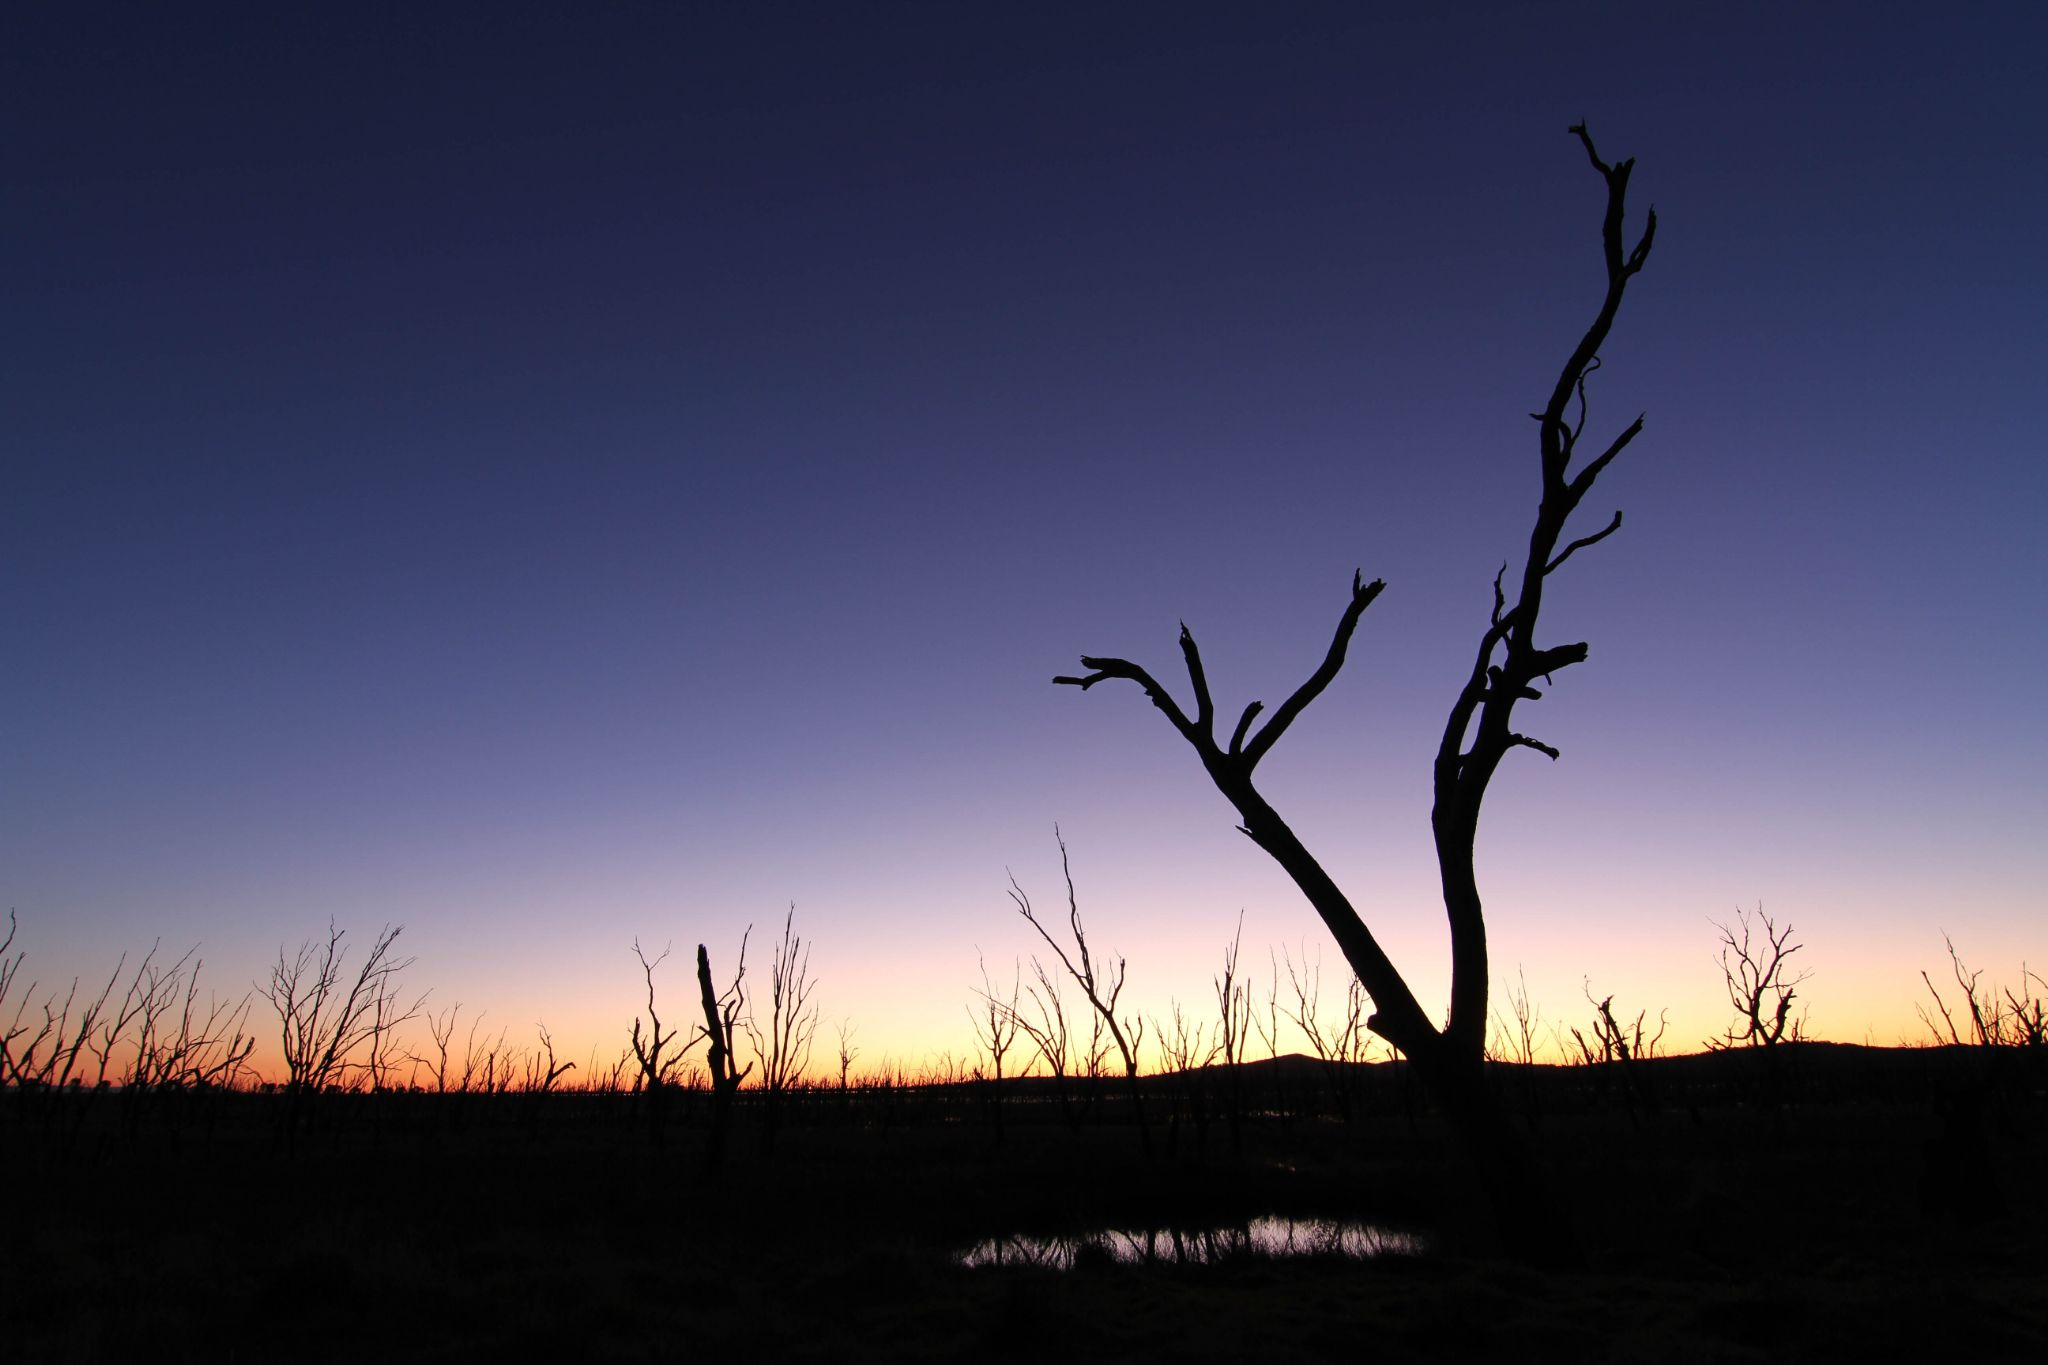 Sunset by Jayson Pratt